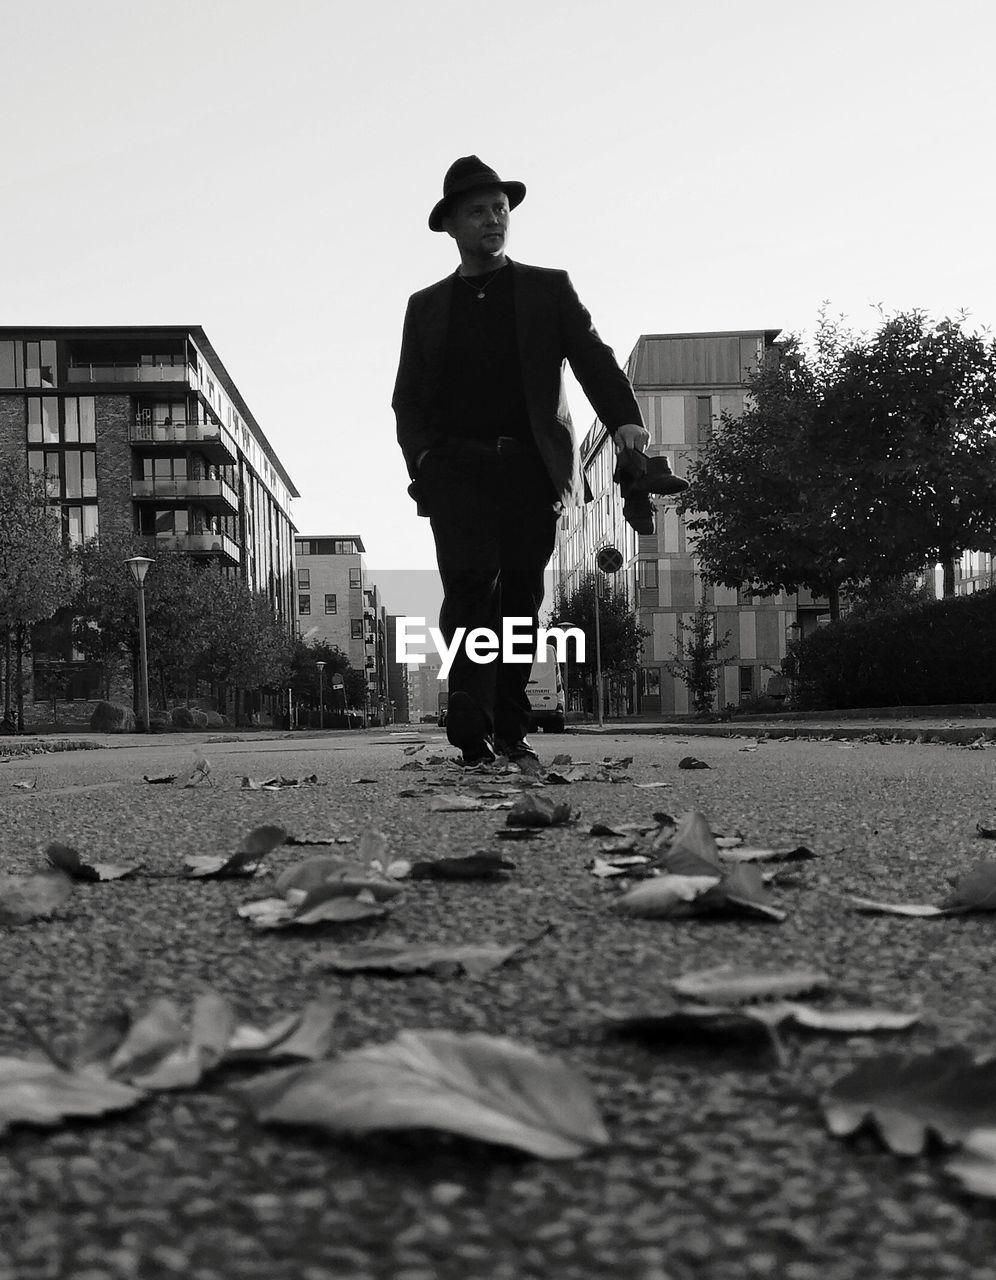 Man walking on street in city against sky